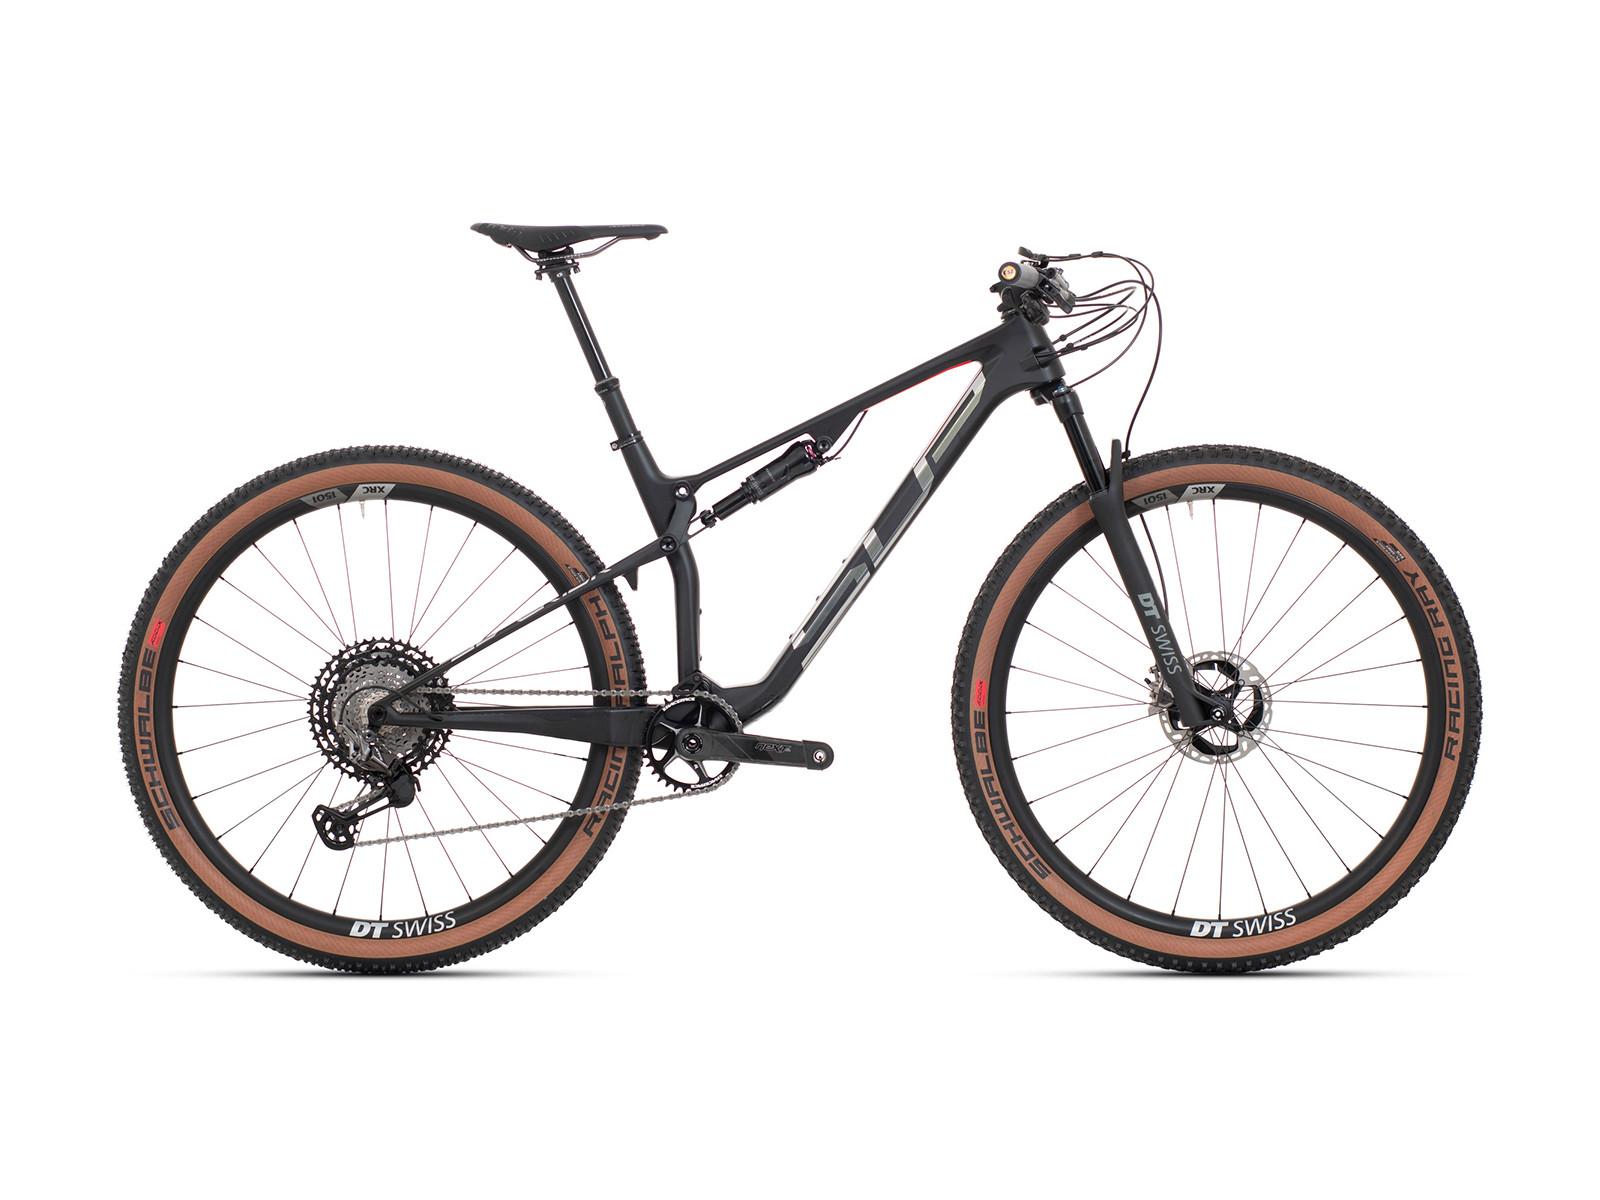 mountainbike-superior-team-xf29-r-2021.jpg